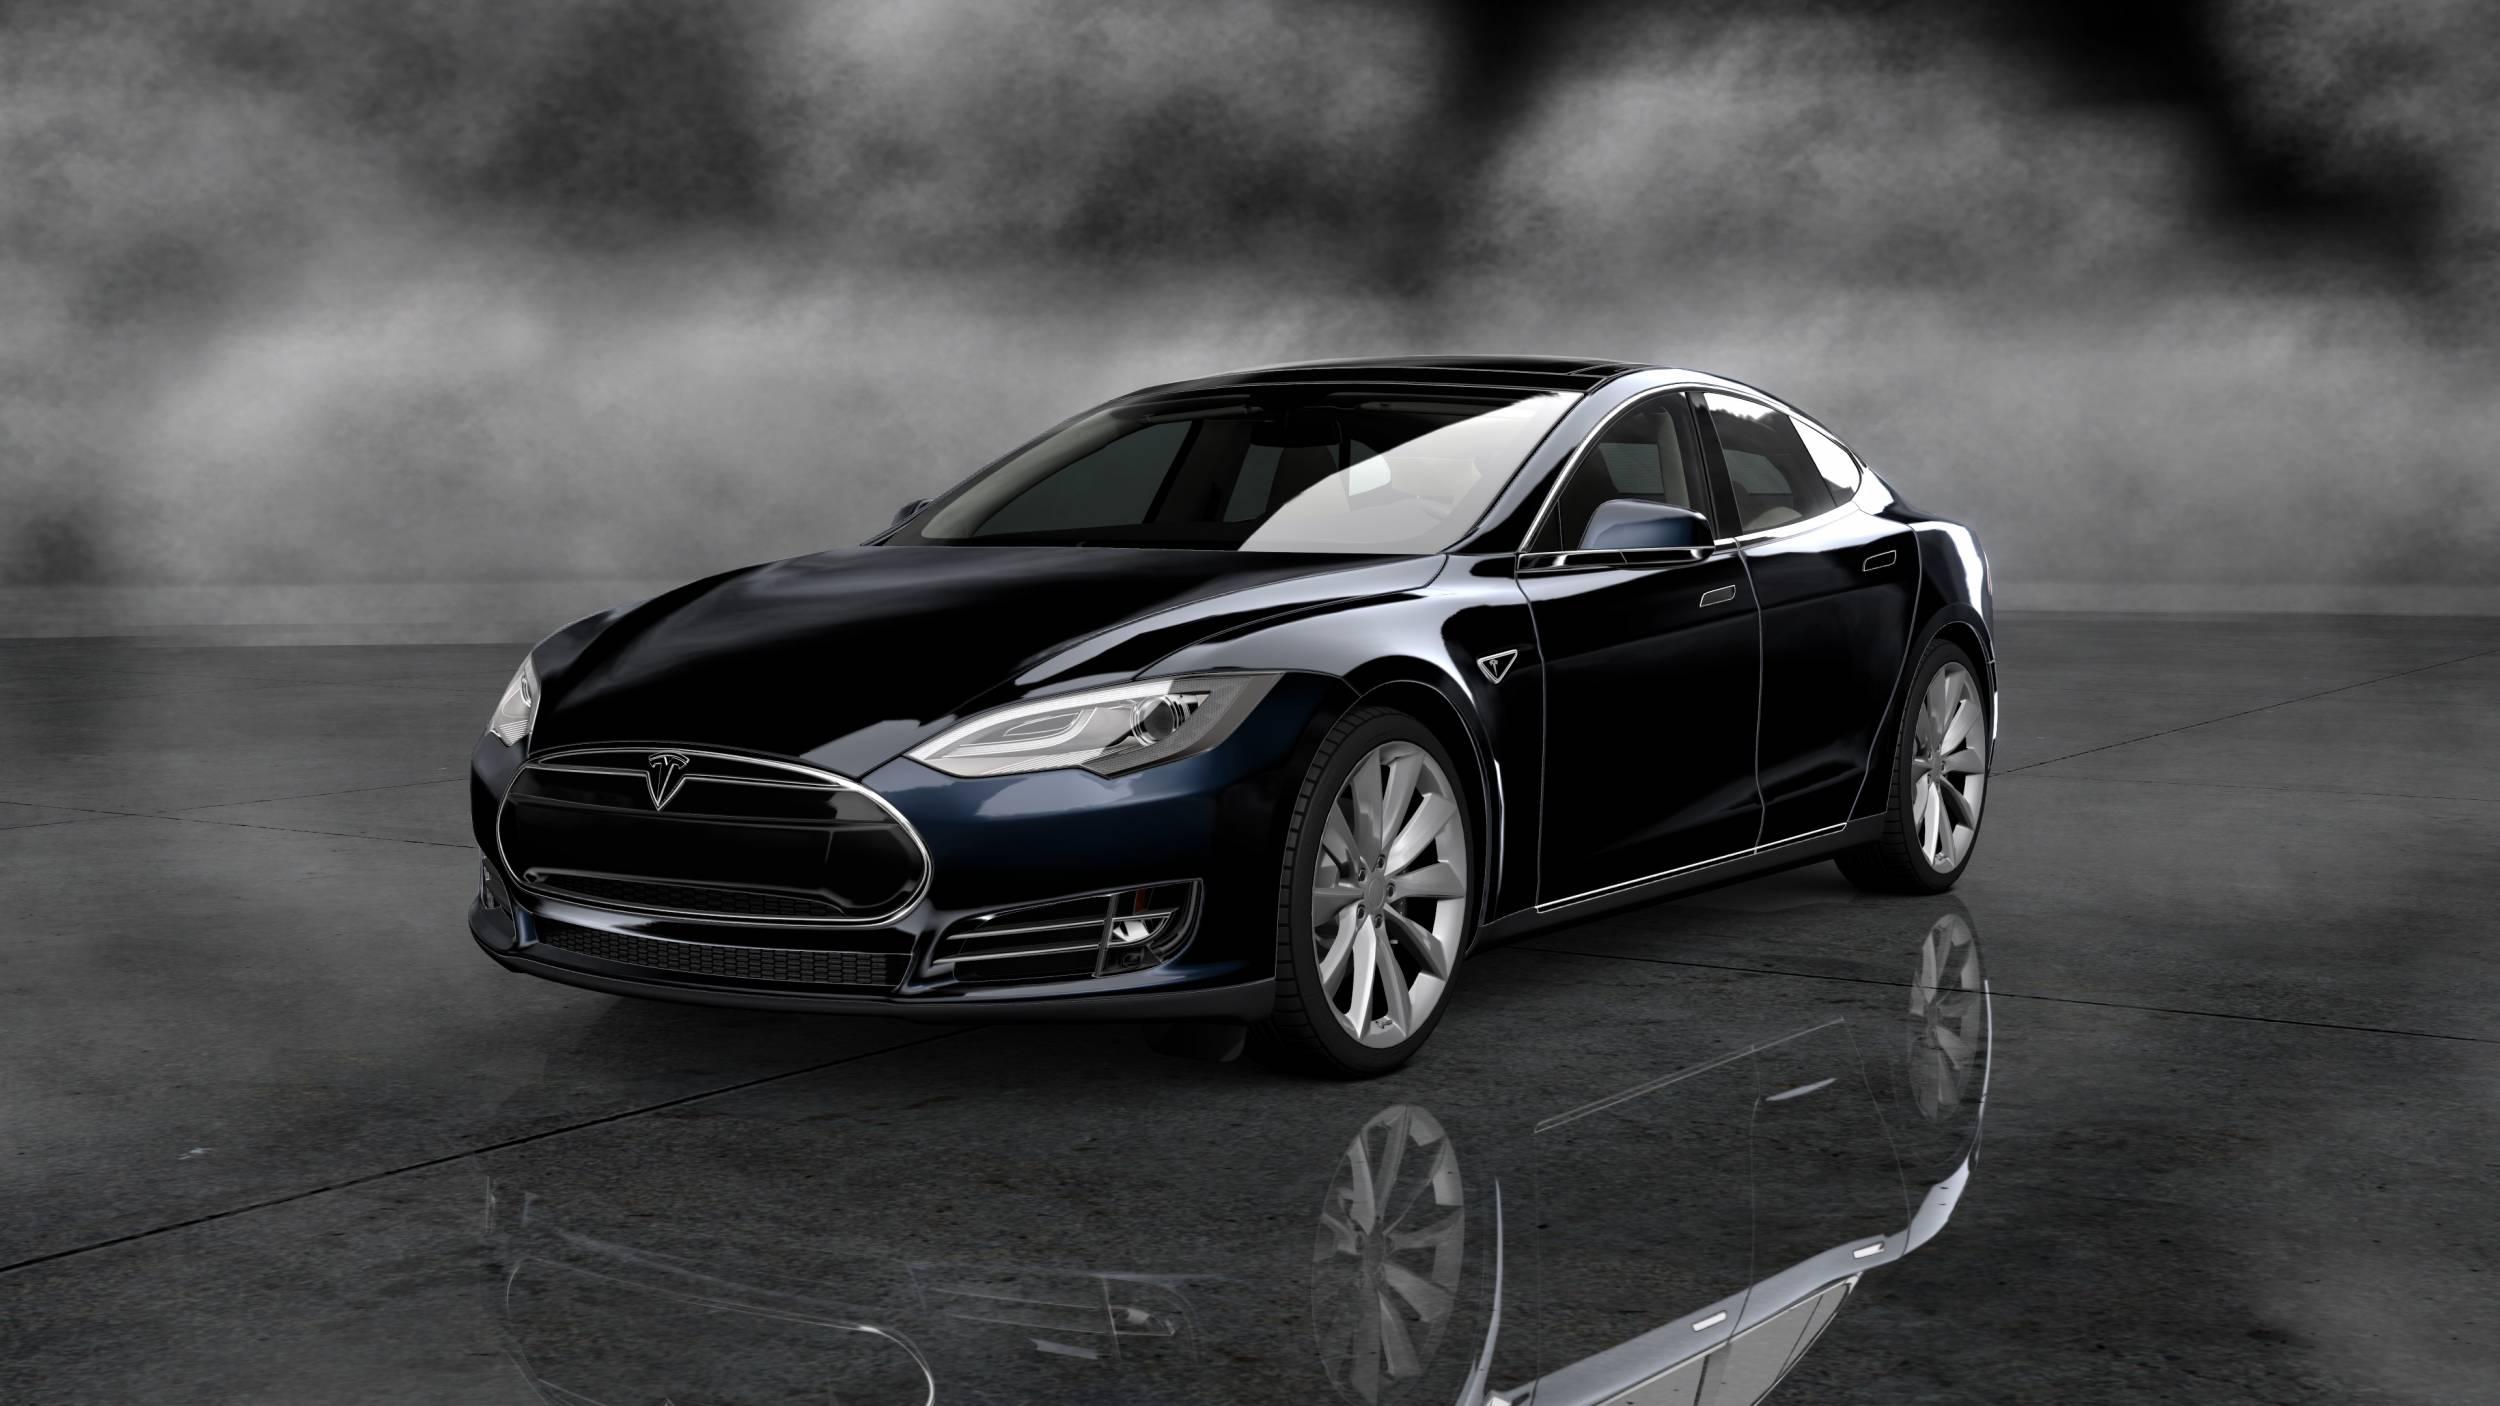 Black Tesla Wallpapers Top Free Black Tesla Backgrounds Wallpaperaccess